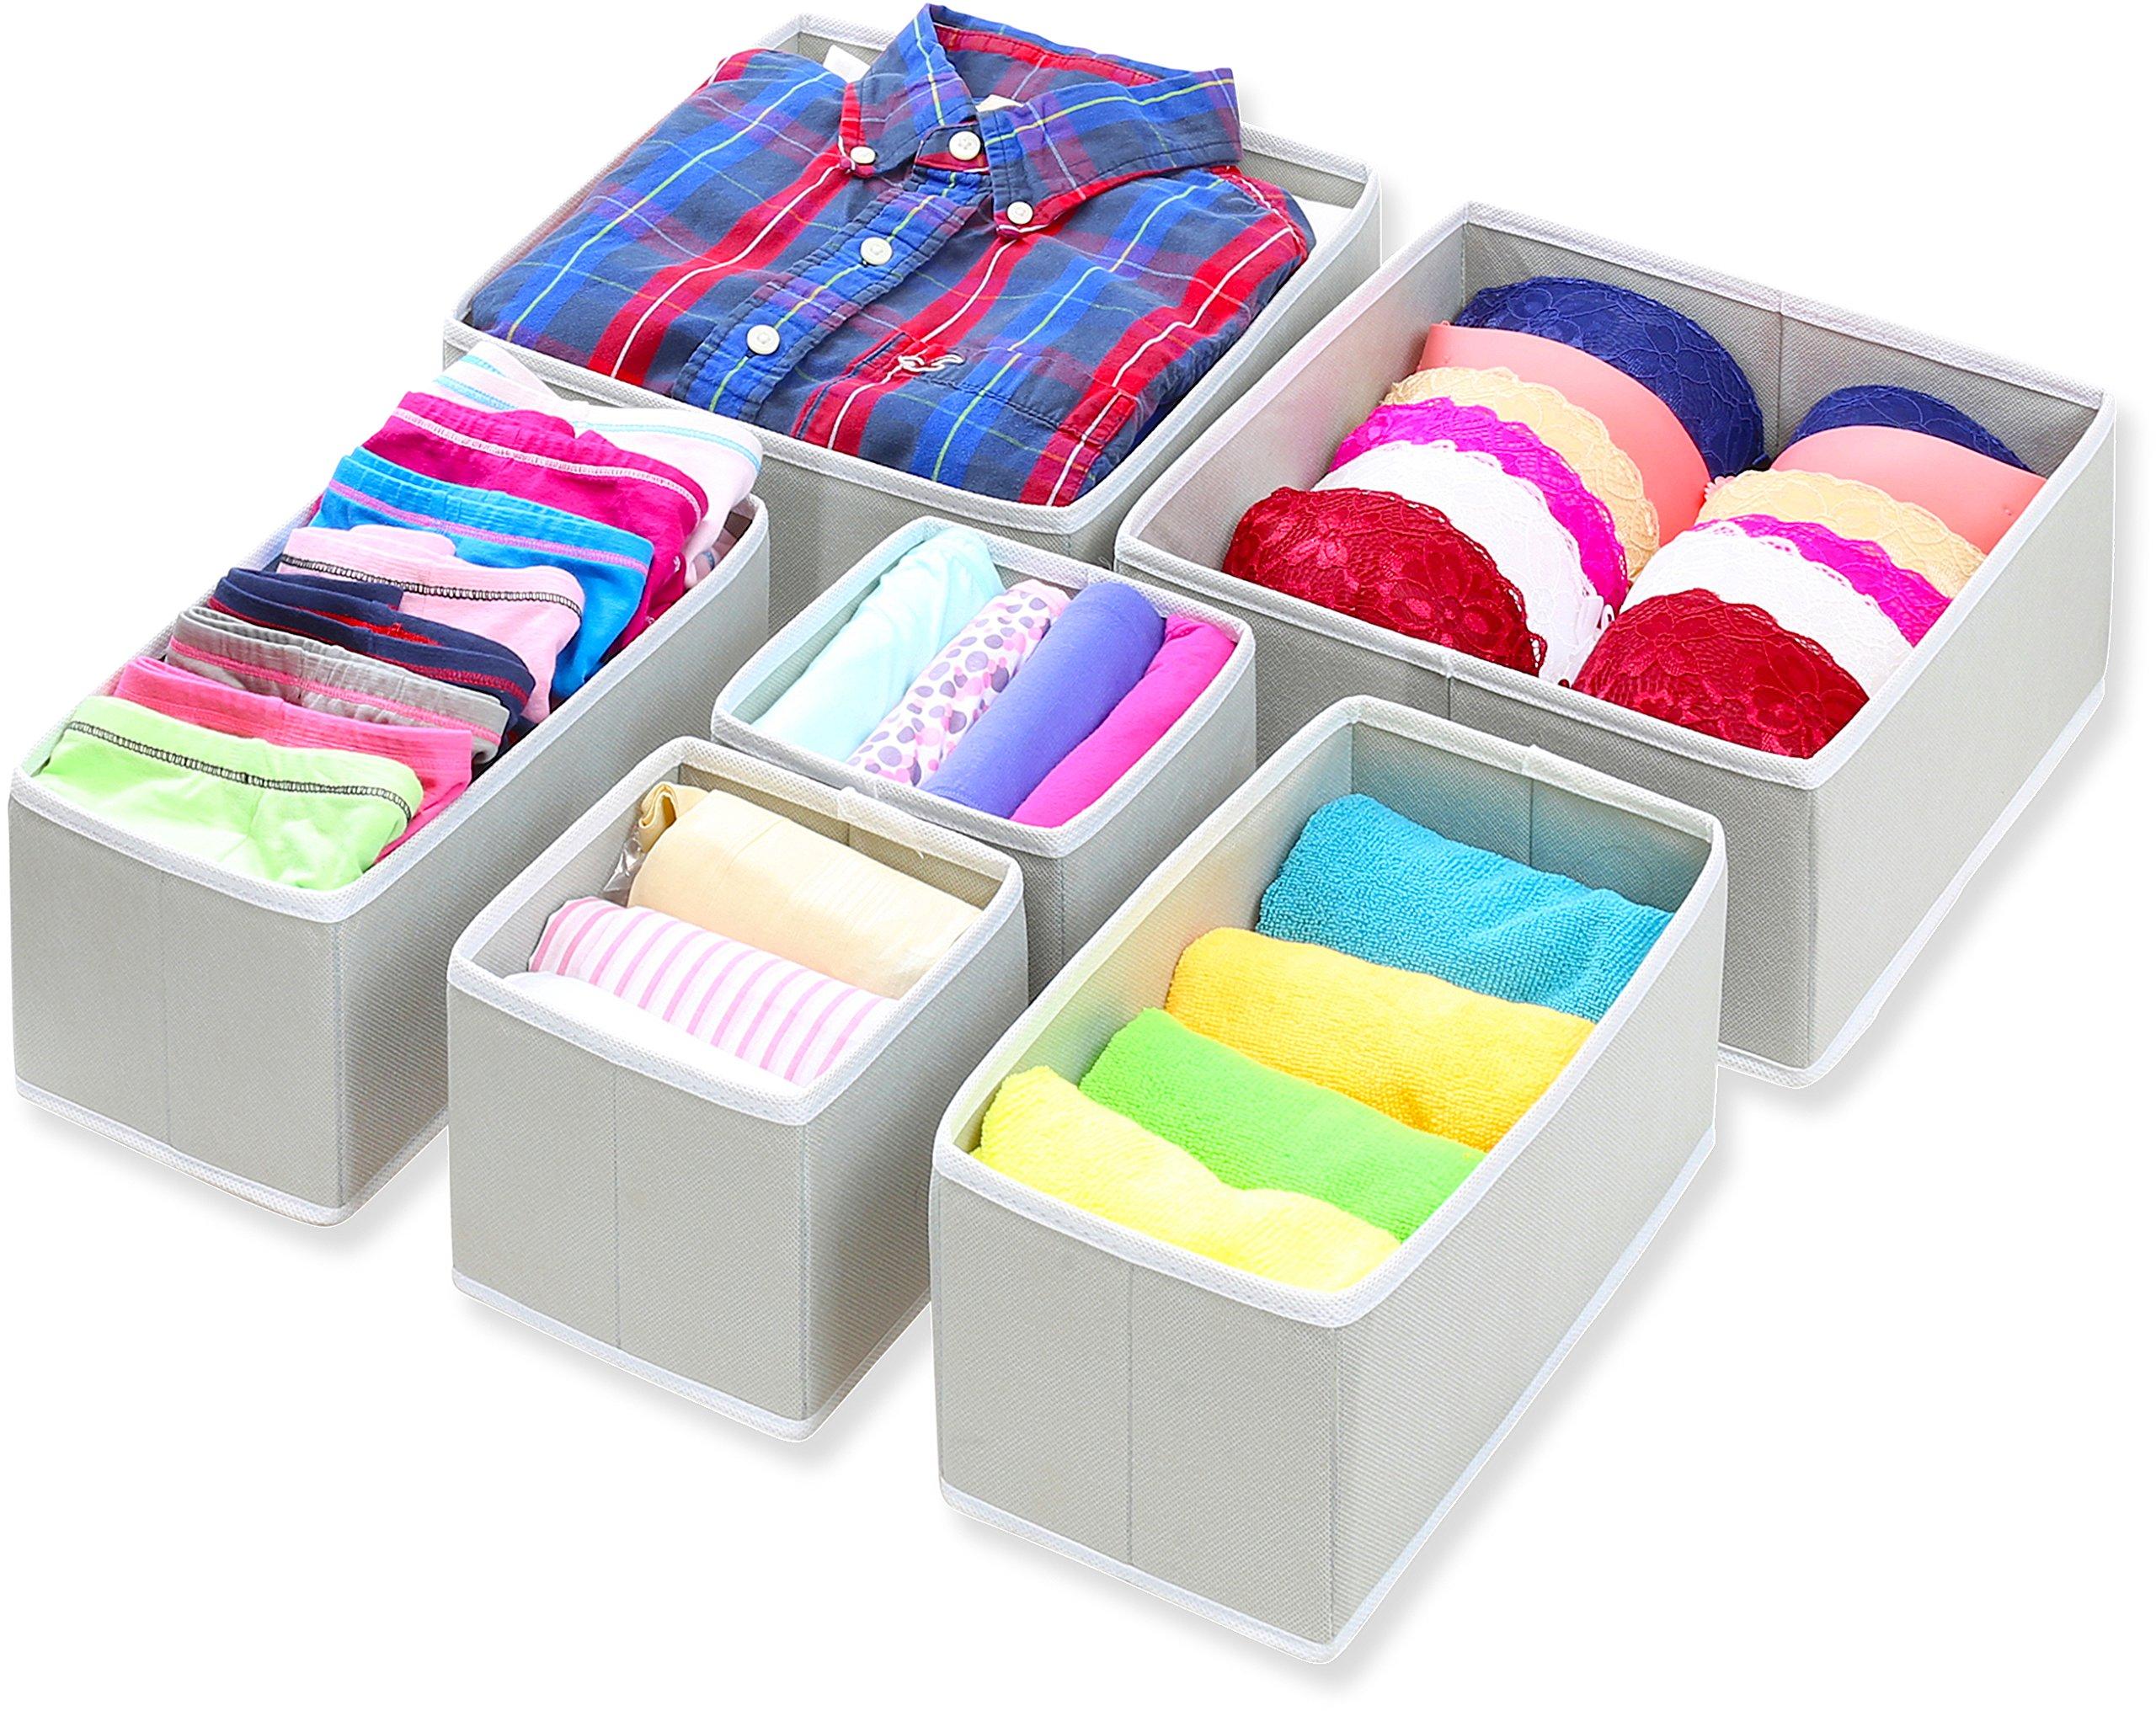 aa6d7ab354b42 Simple Houseware Foldable Cloth Storage Box Closet Dresser Drawer Divider  Organizer Basket Bins for Underwear Bras